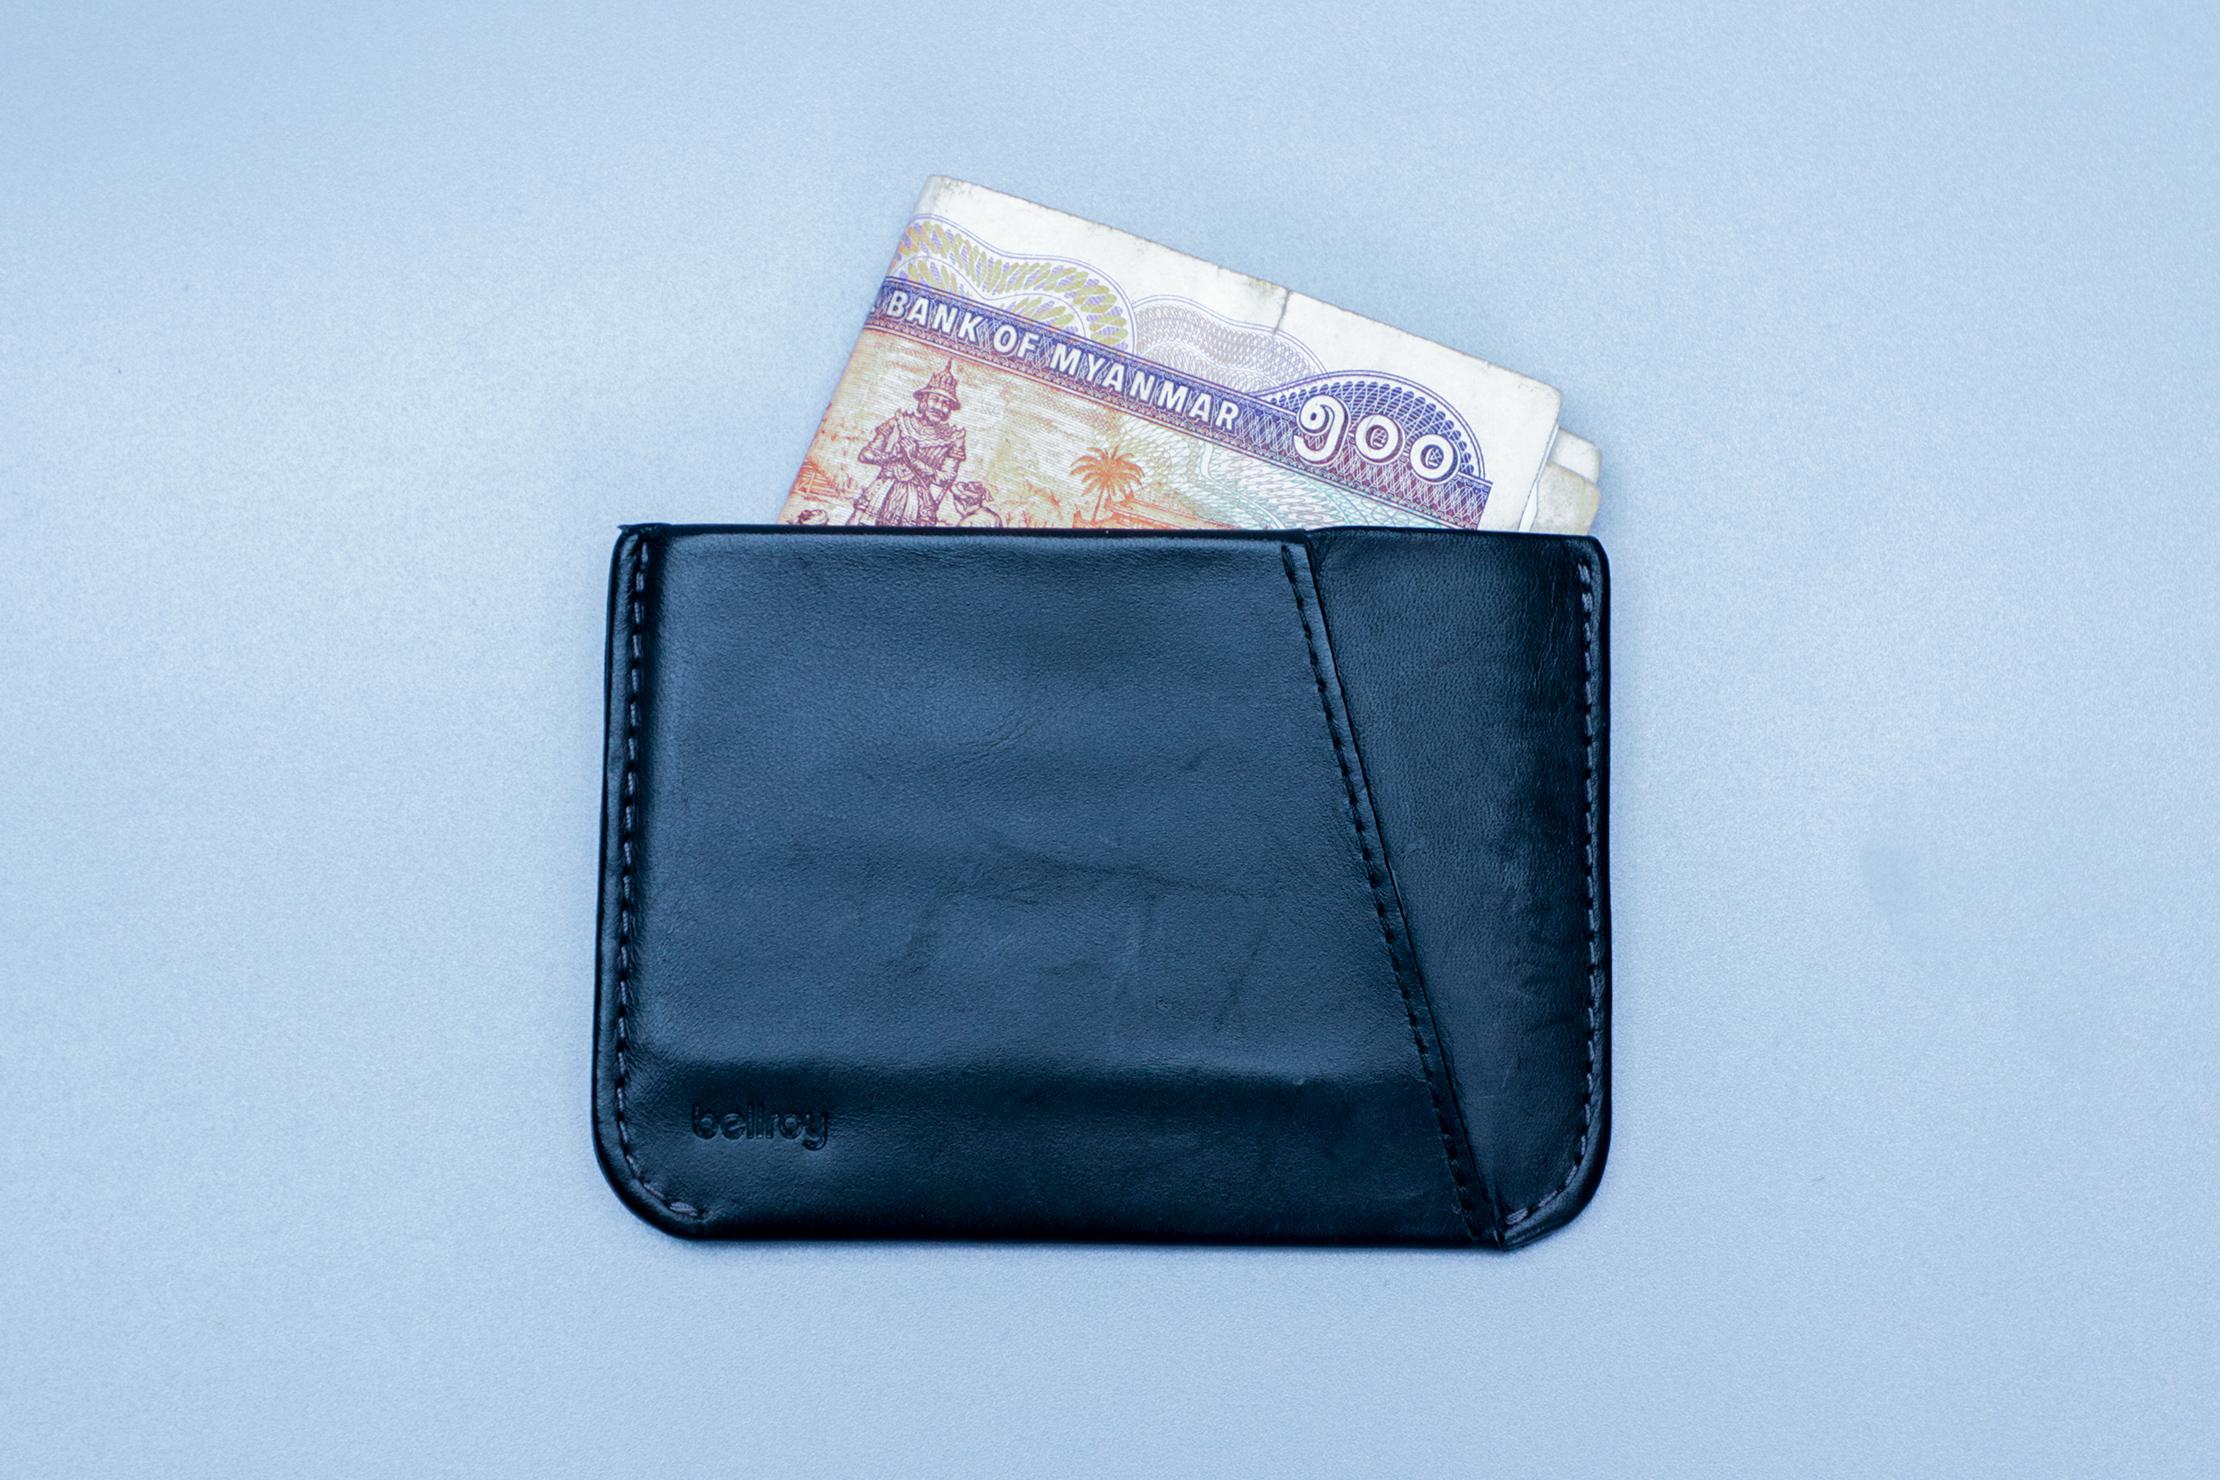 Bellroy Micro Sleeve Cash Peeking Out